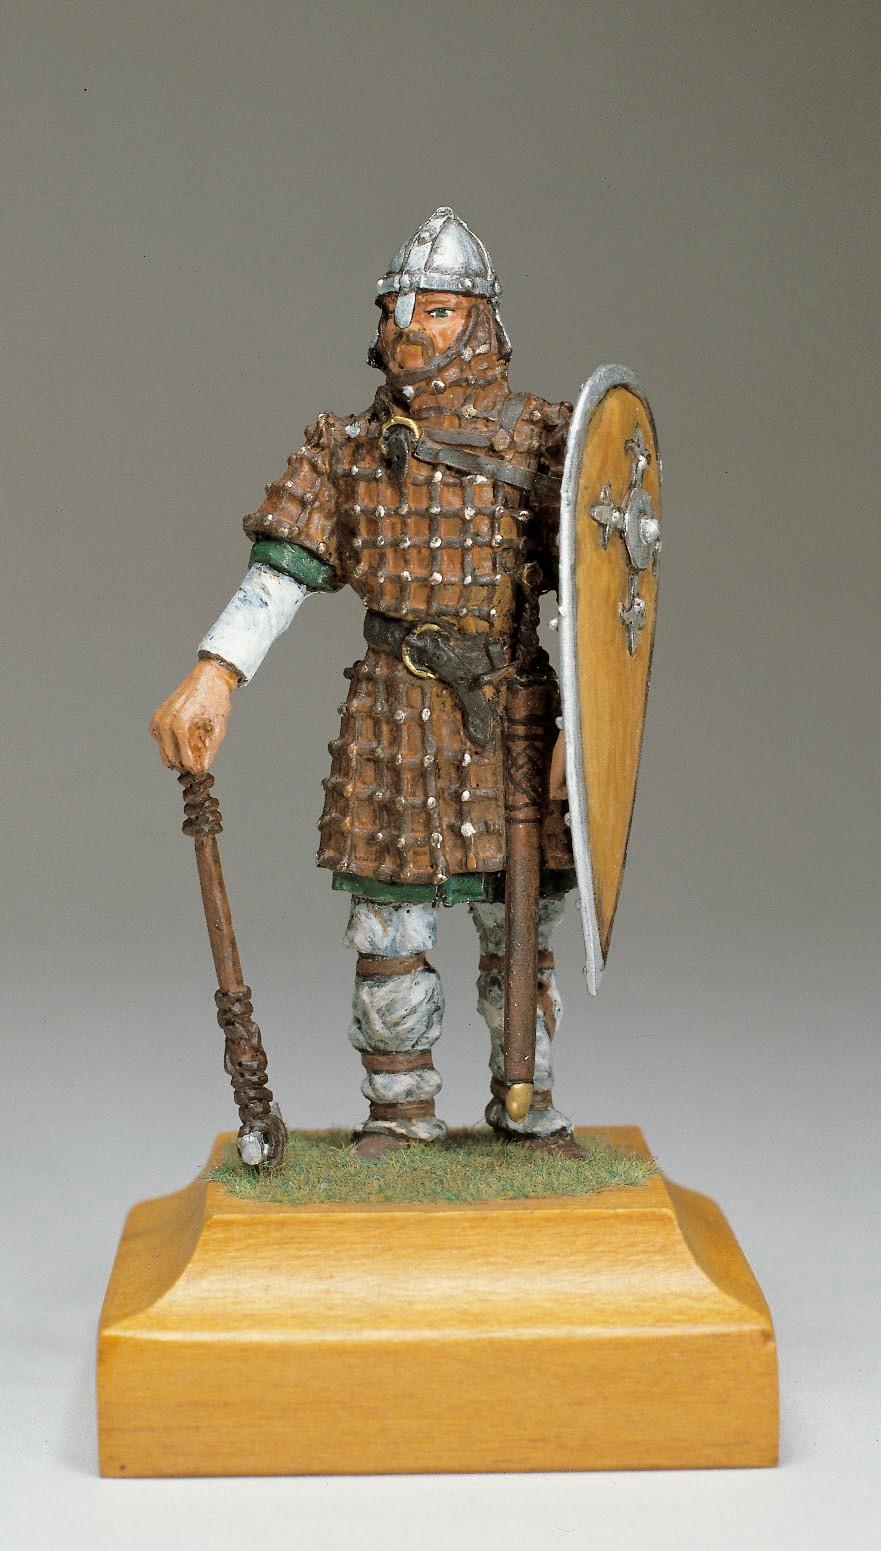 Norman Knight Figurine, 1066 (Amati)